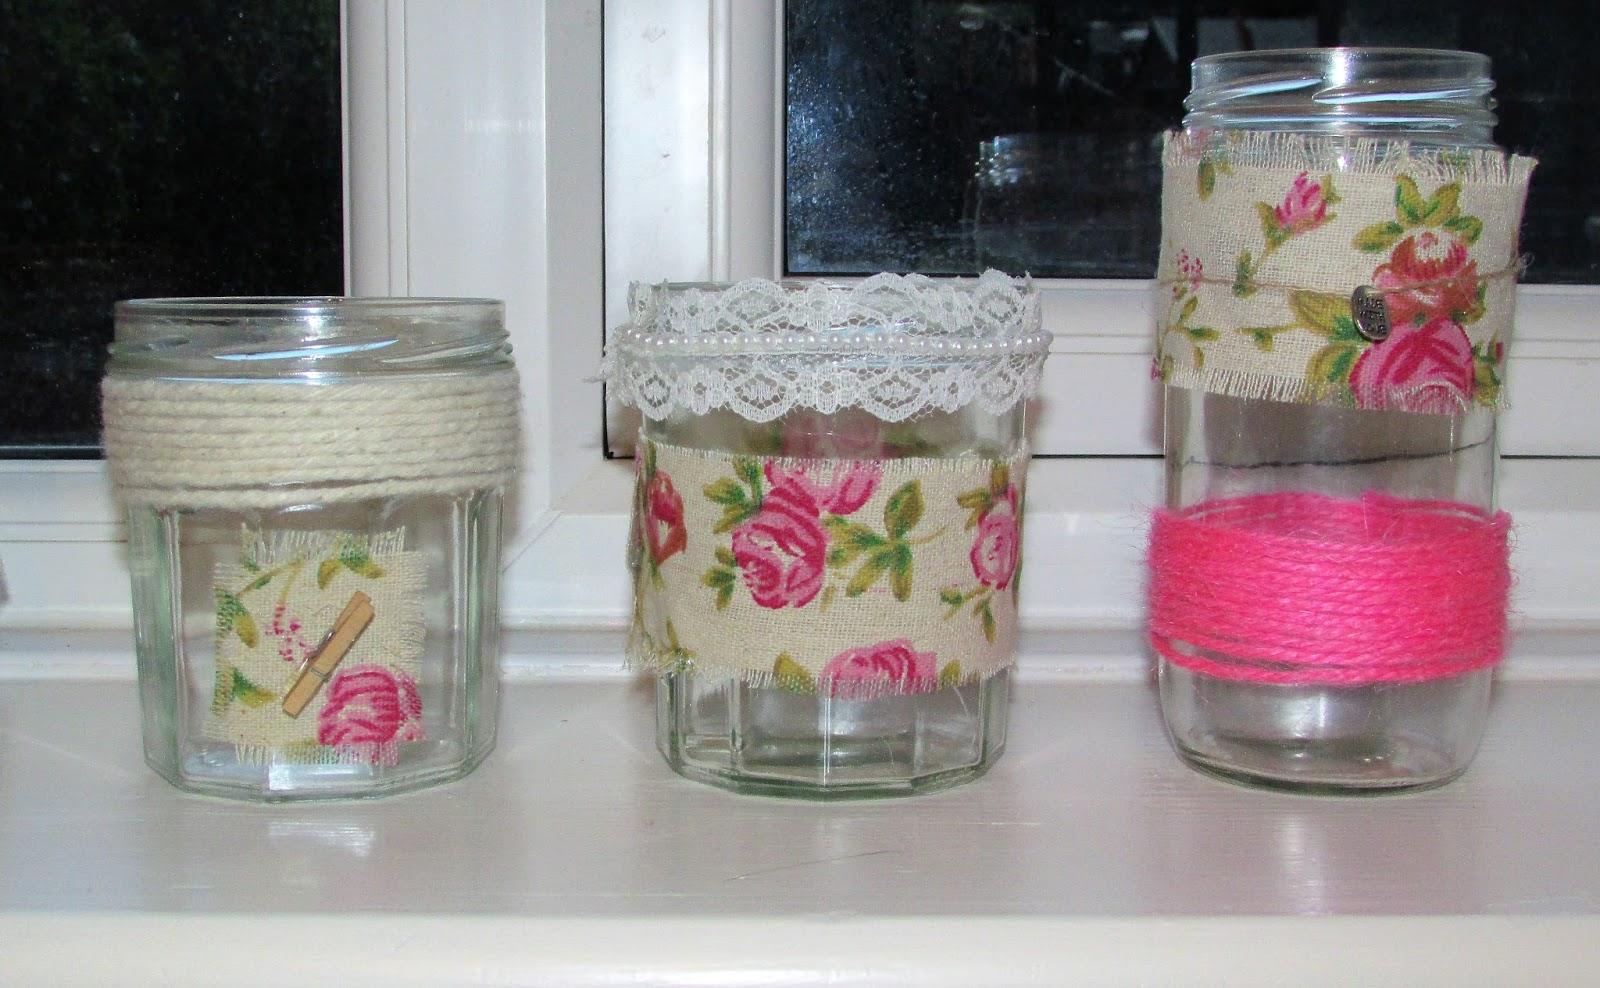 lollipop pretty decorated jars